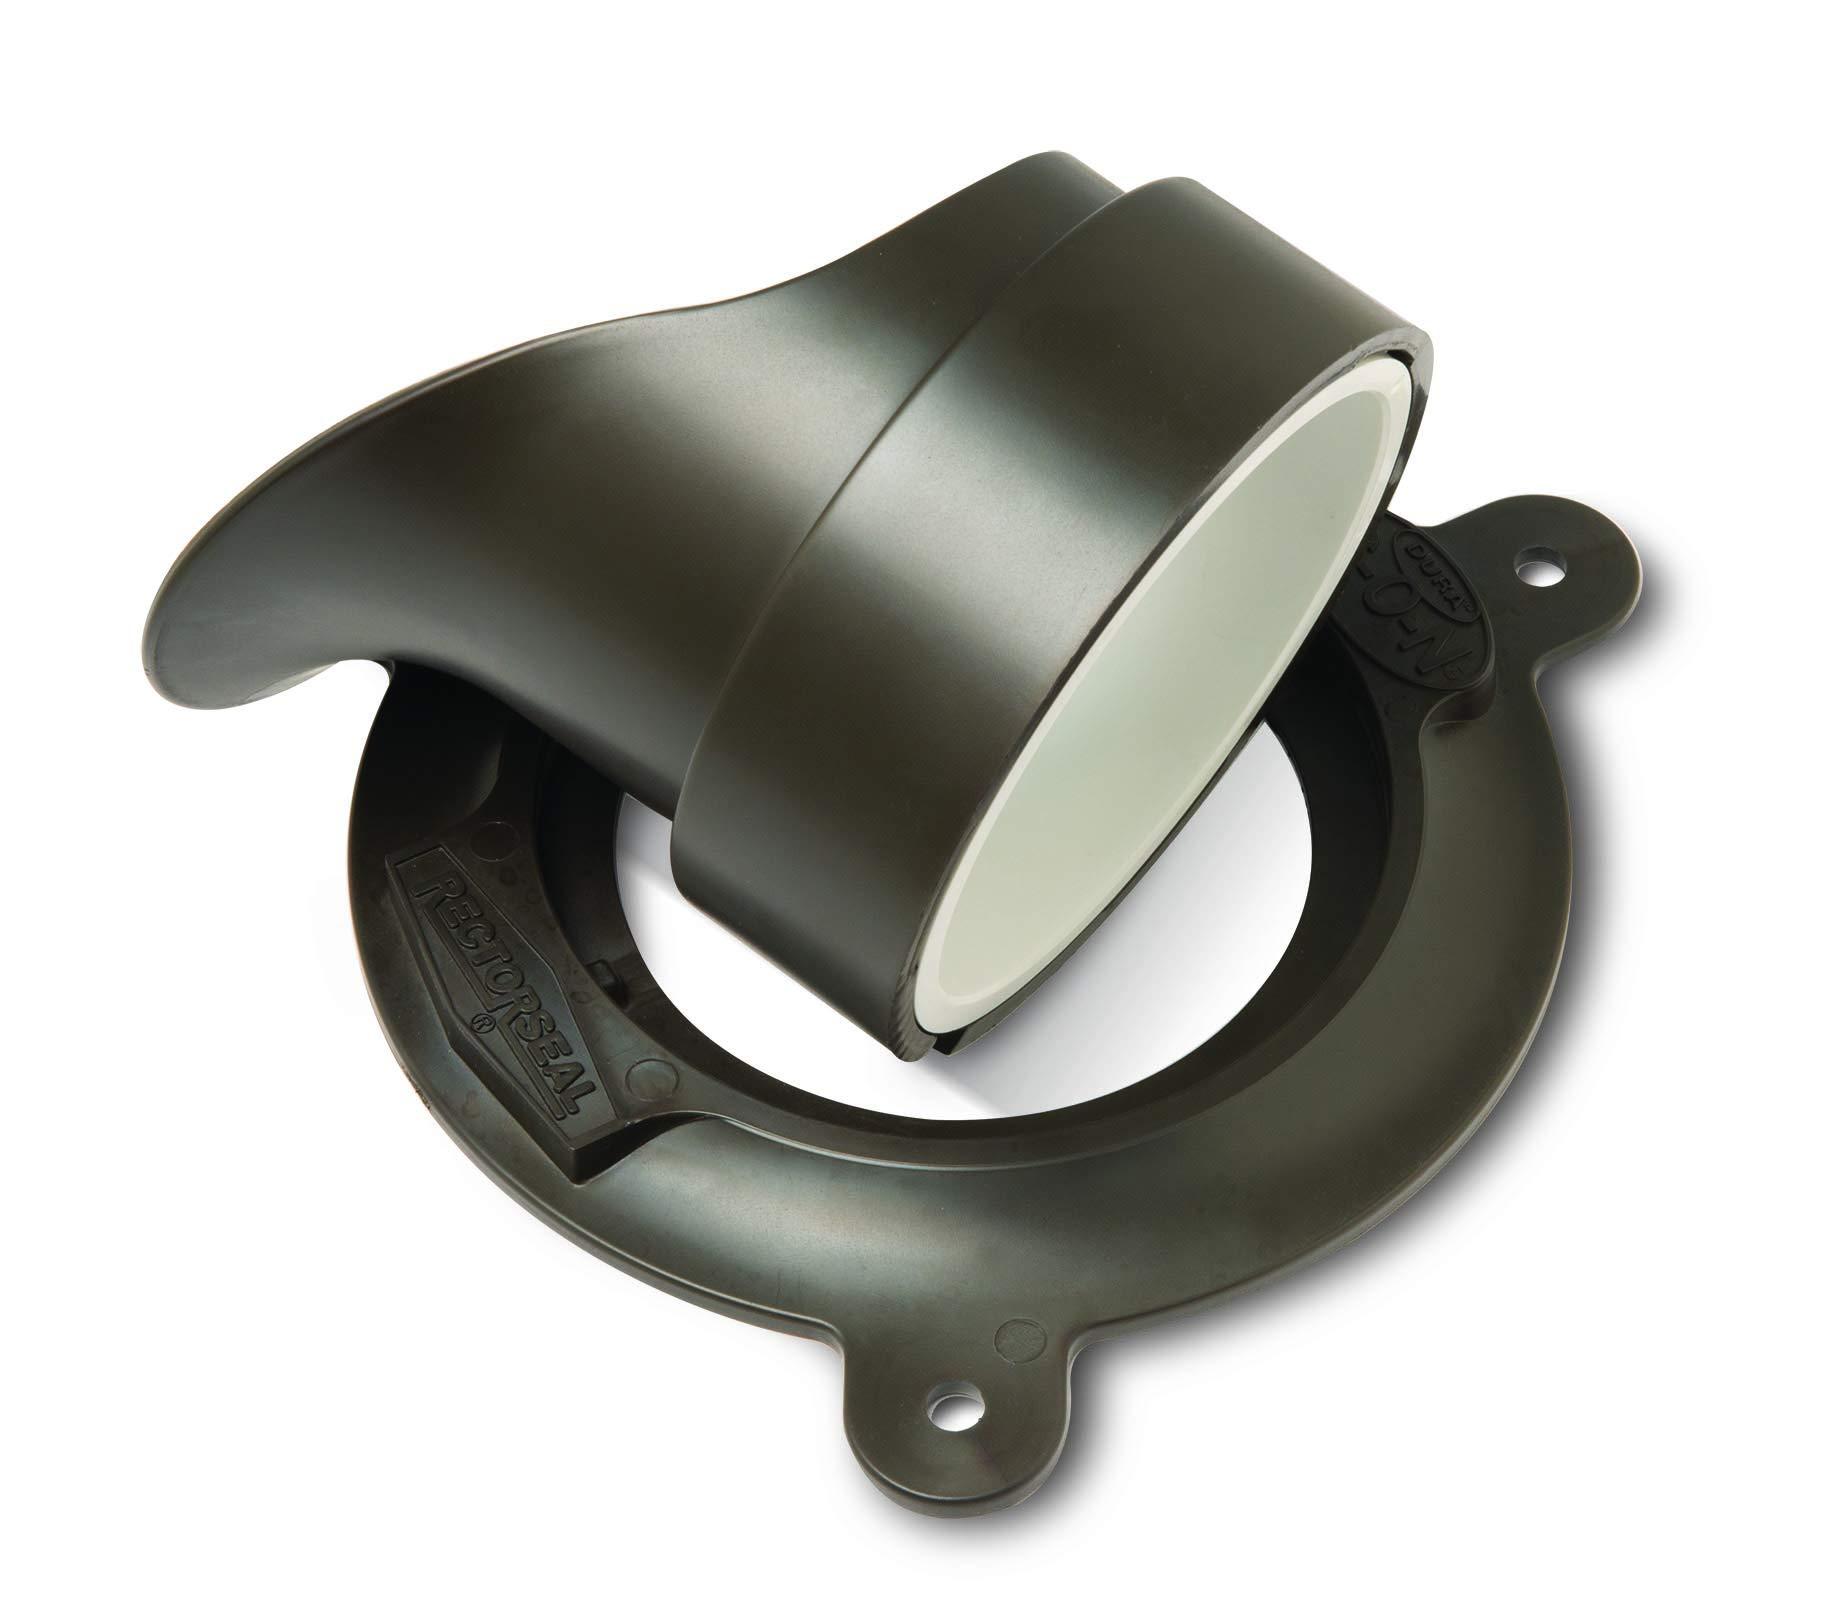 Rectorseal 82763 Dura G-O-N downspout nozzle 3 inch oil rubbed bronze by Rectorseal